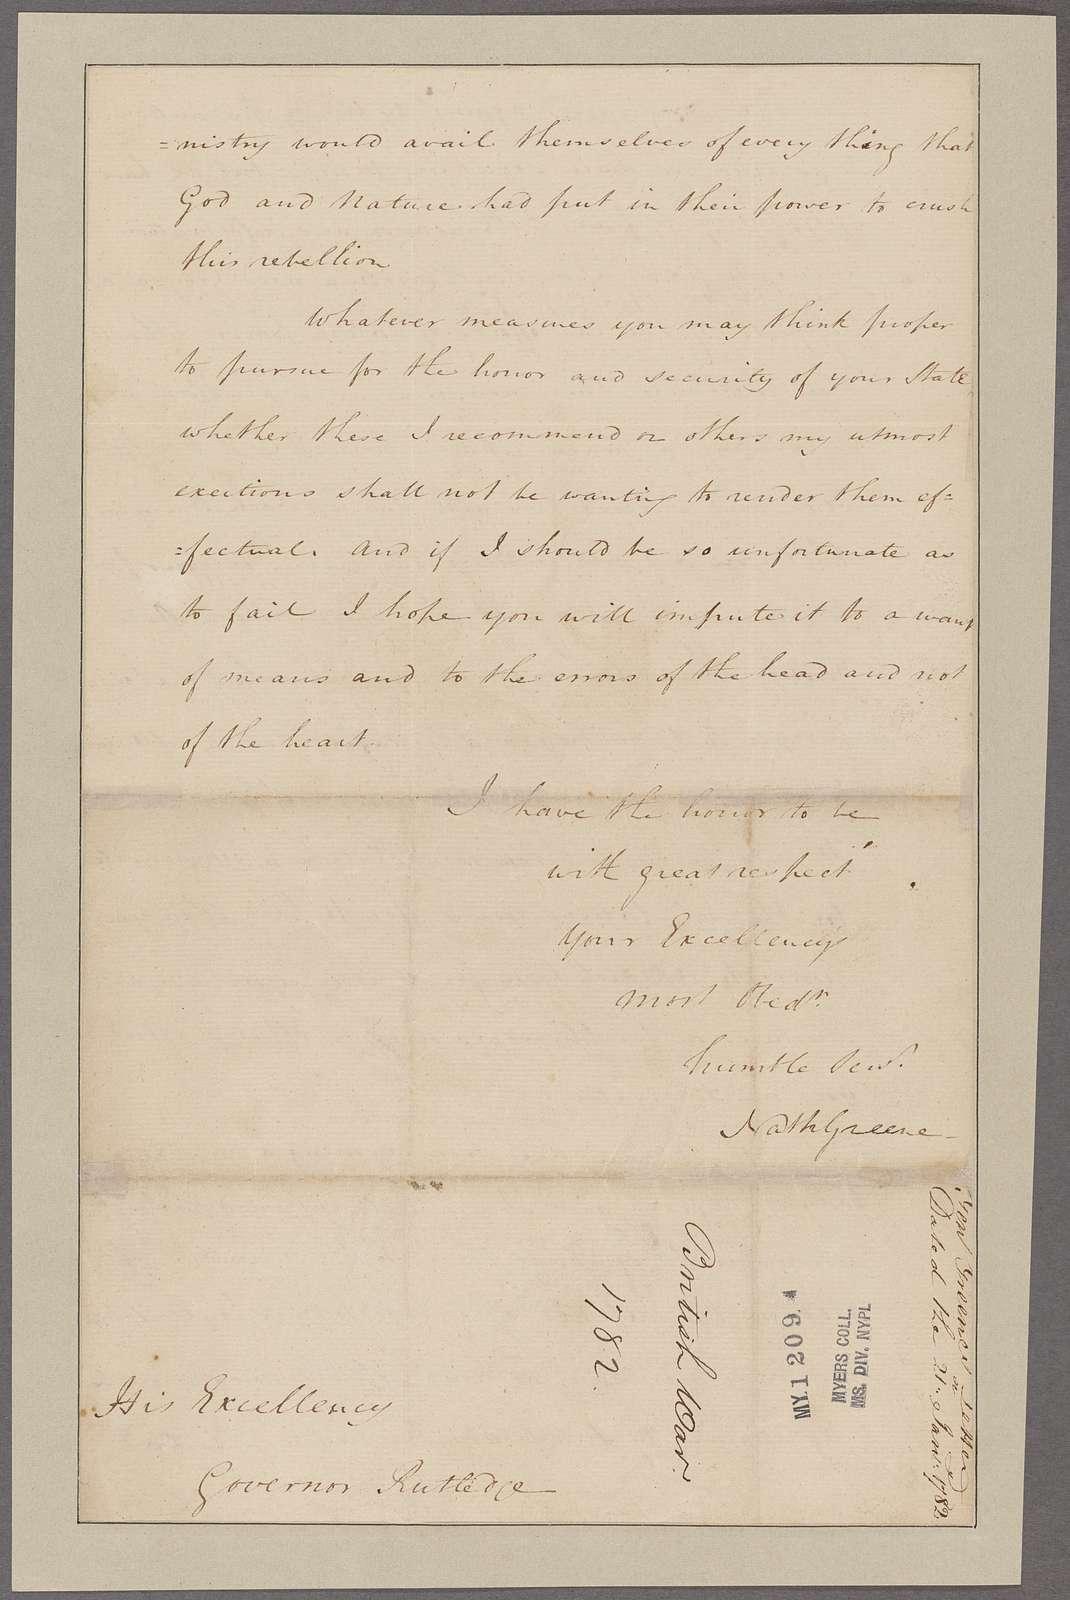 Greene, Nathanael. Headquarters. To Governor Rutledge